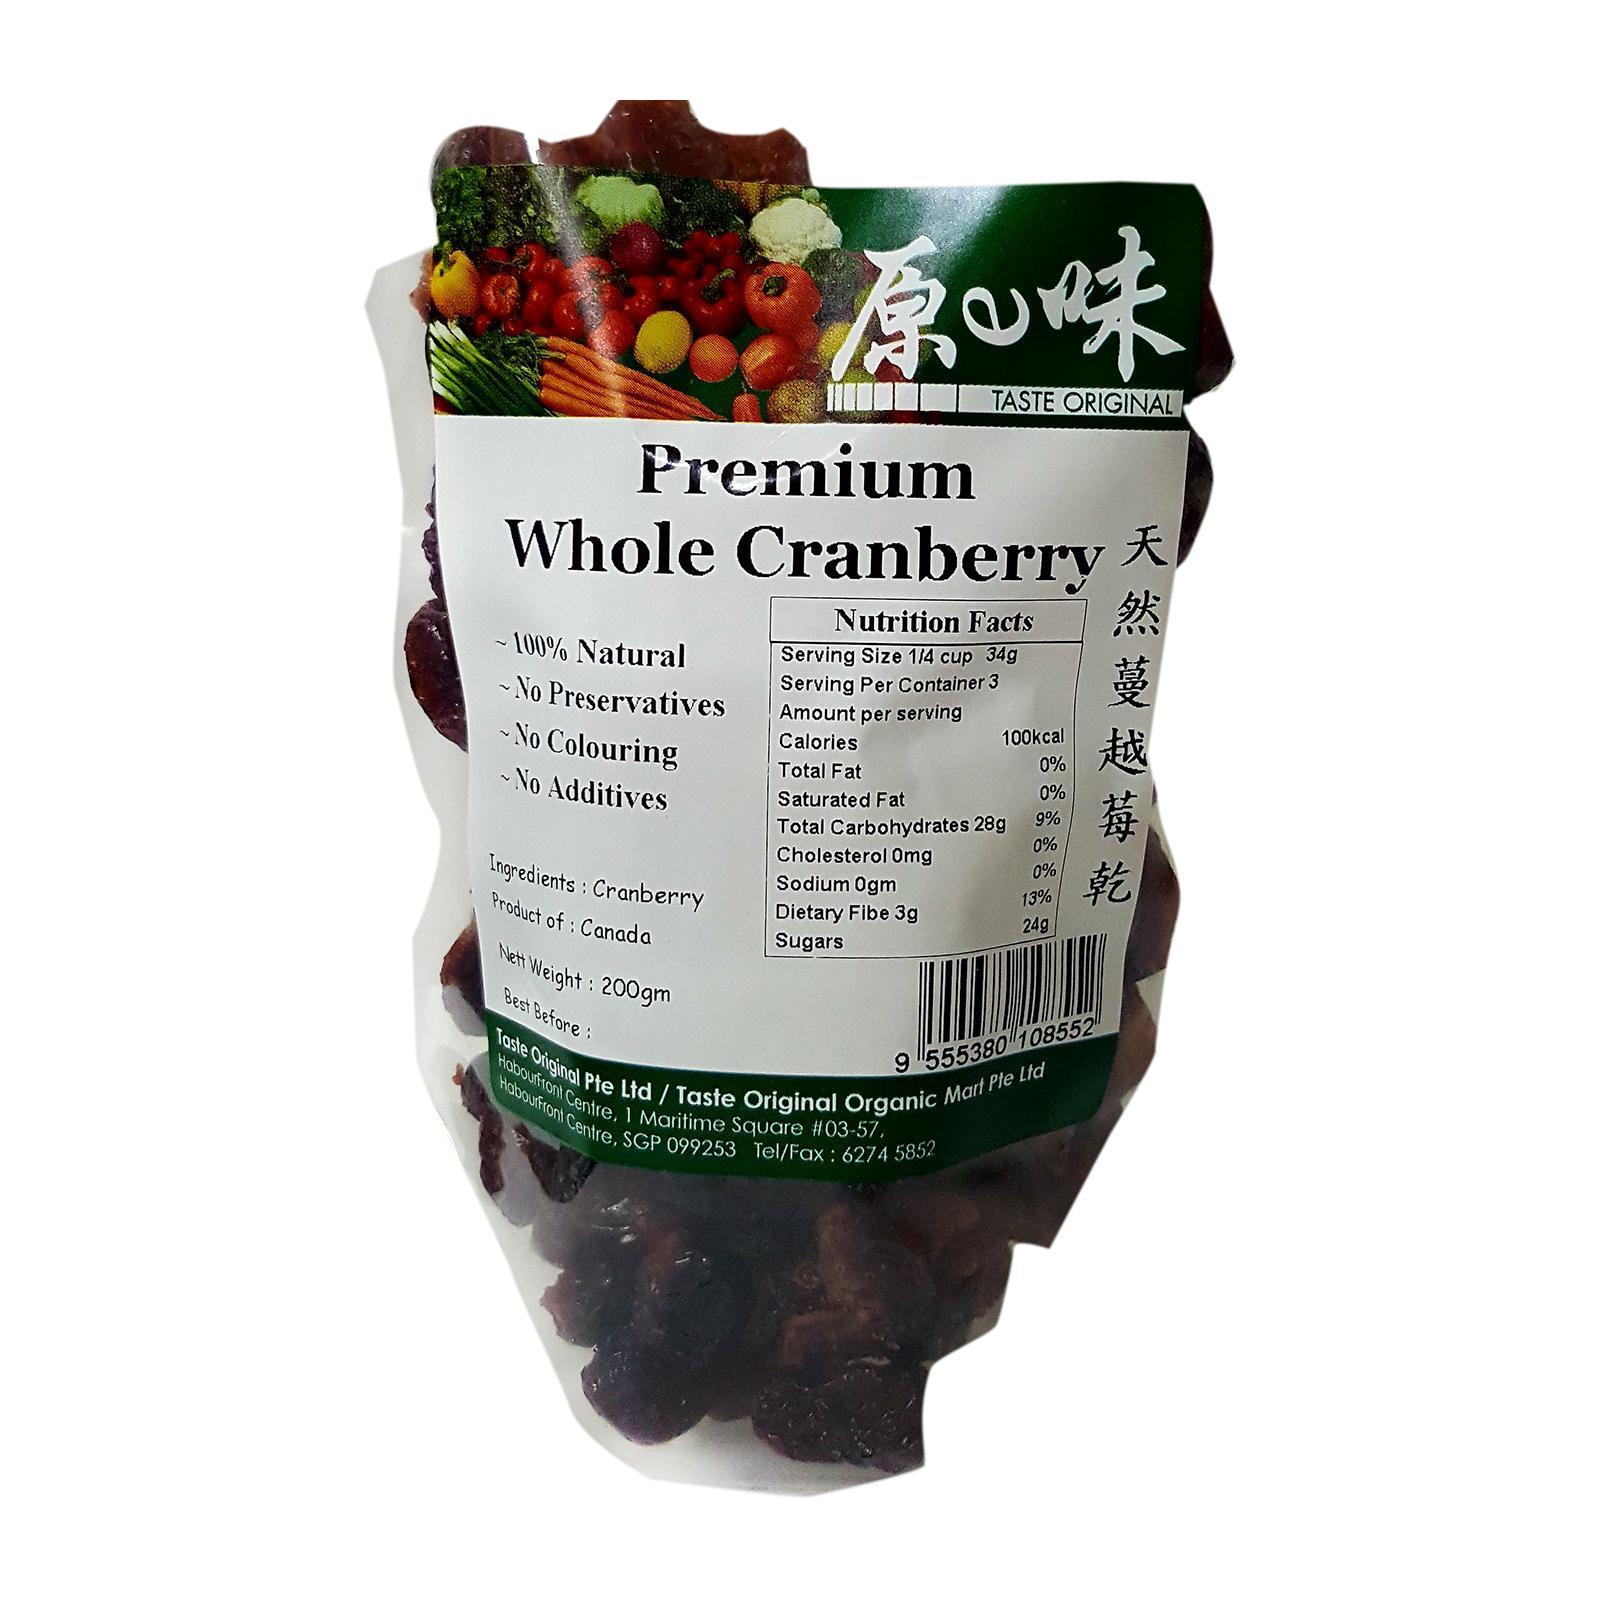 Taste Original Natural Dried Whole Cranberry